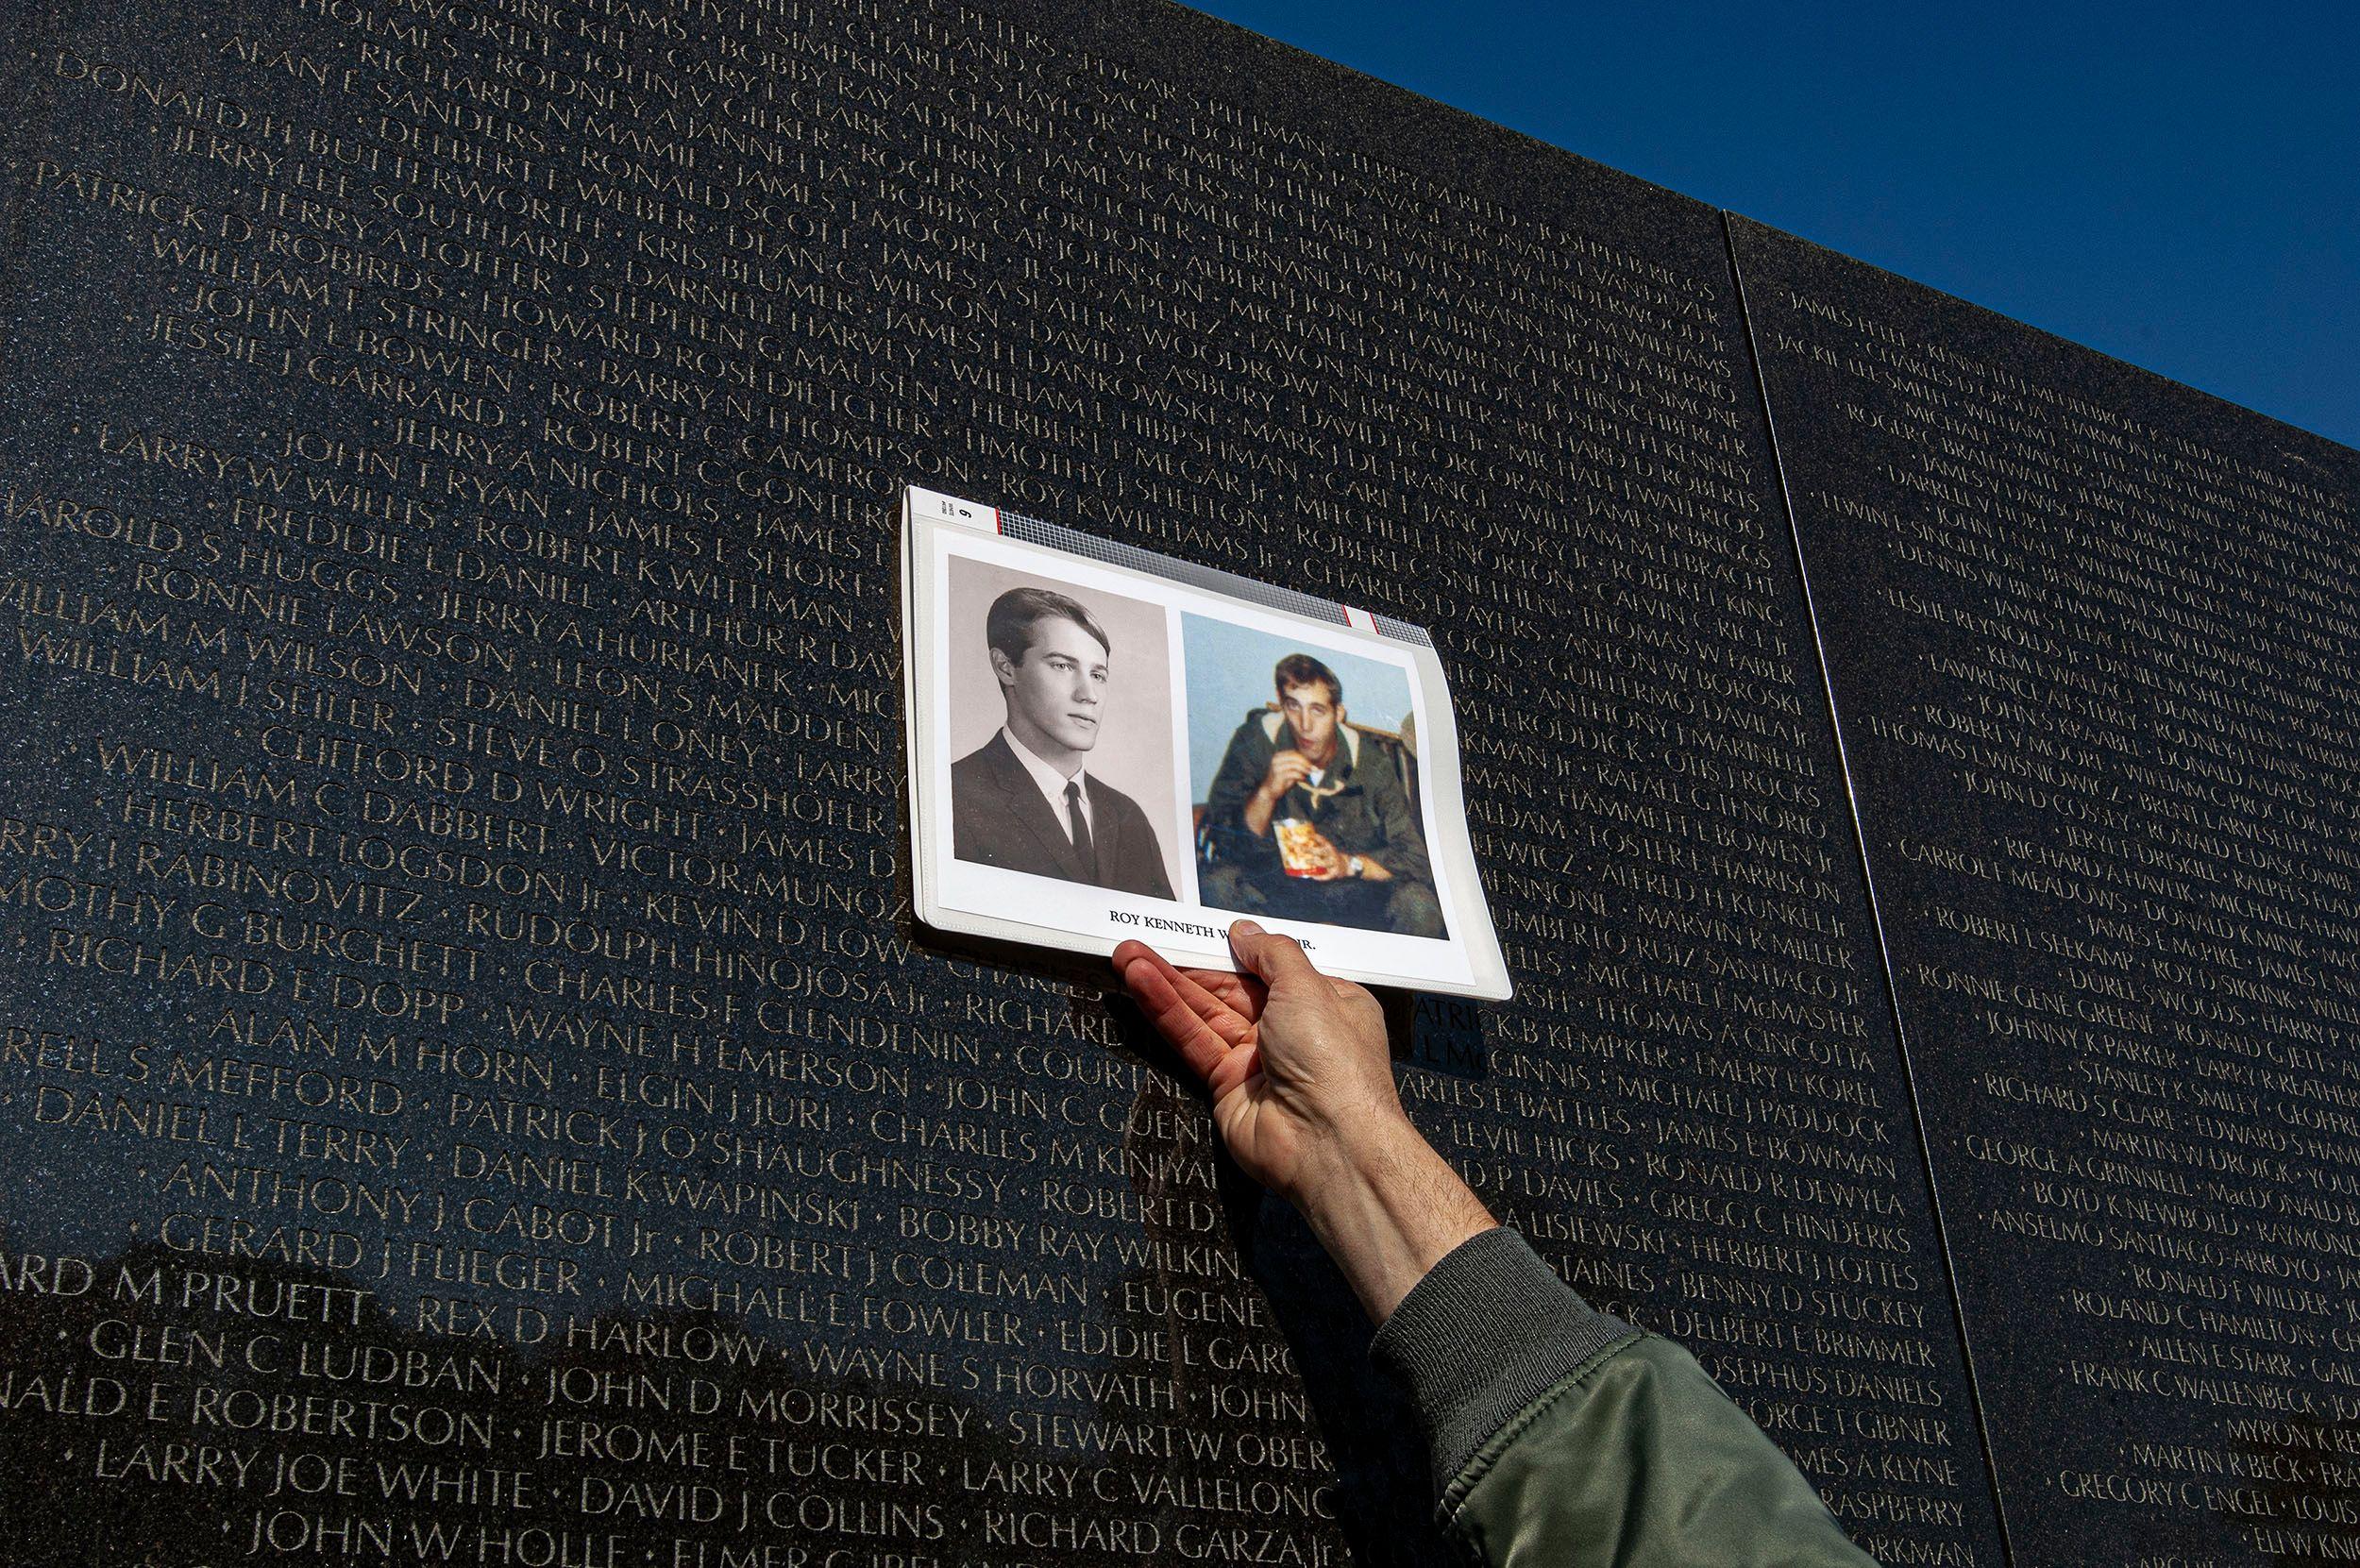 Veterans Day, Washington, D.C.